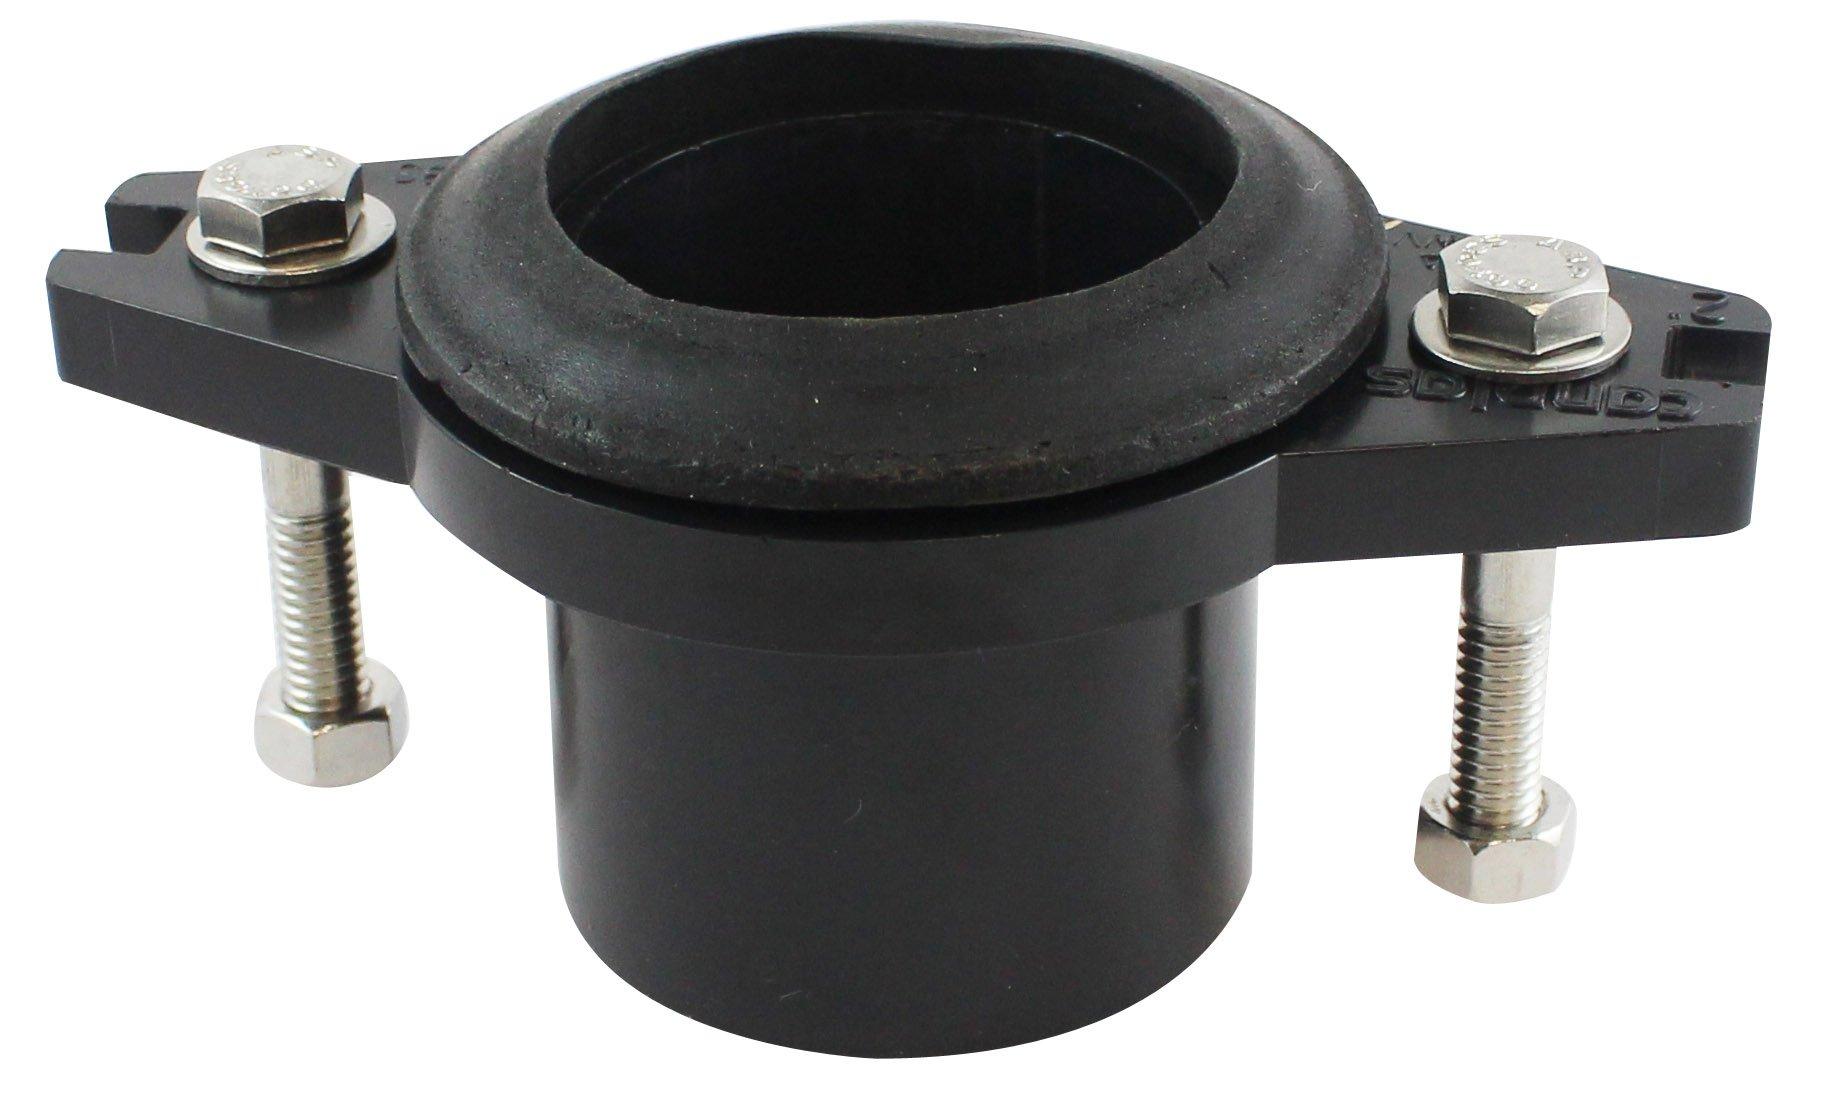 Canplas 113660 Urinal Flange Kit by Canplas (Image #1)